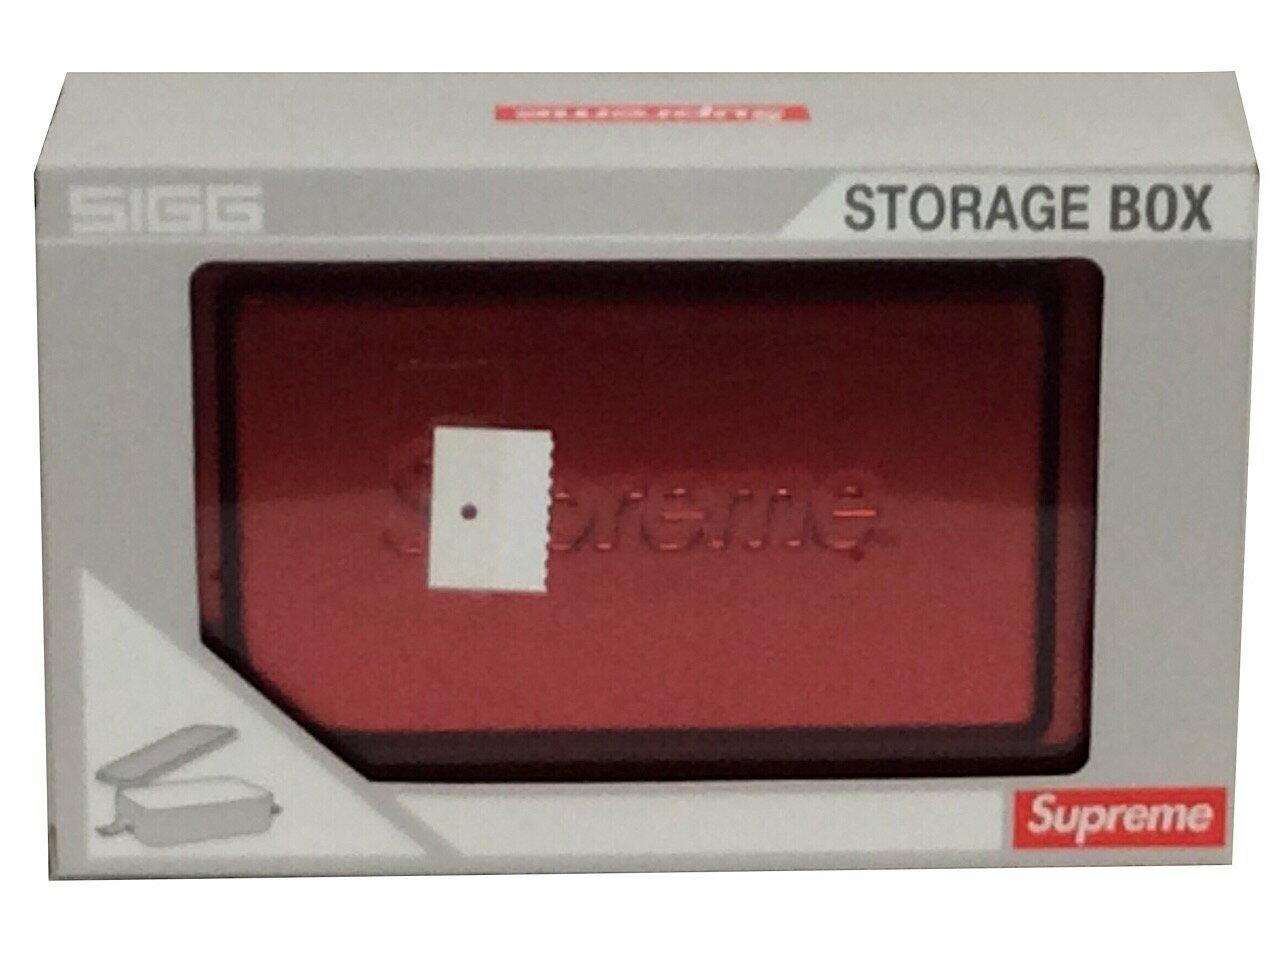 弁当箱・水筒, 弁当箱 SUPREME 18SS Sigg Small Metal Storage Box RED